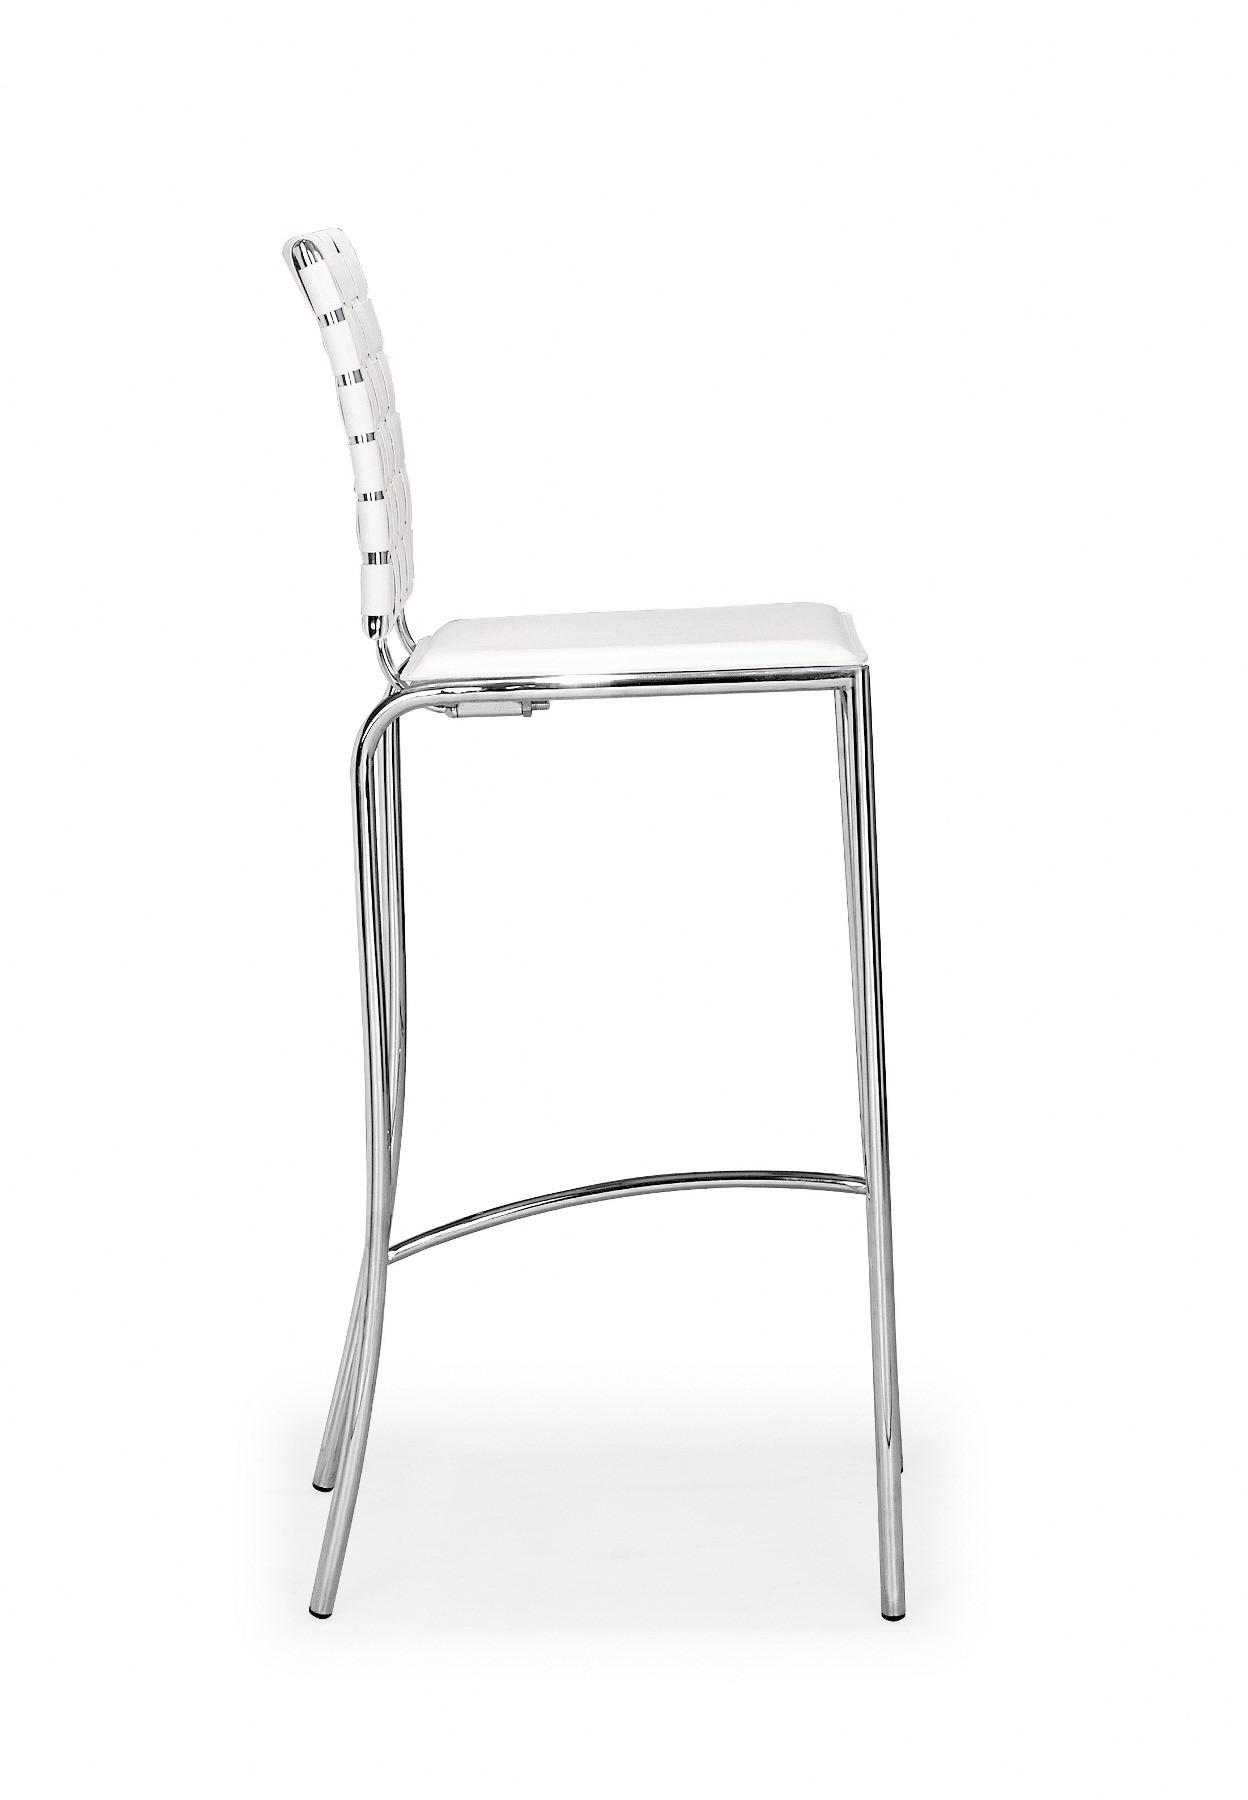 Criss Cross Bar Chair White Set Of 2 From Zuo Mod